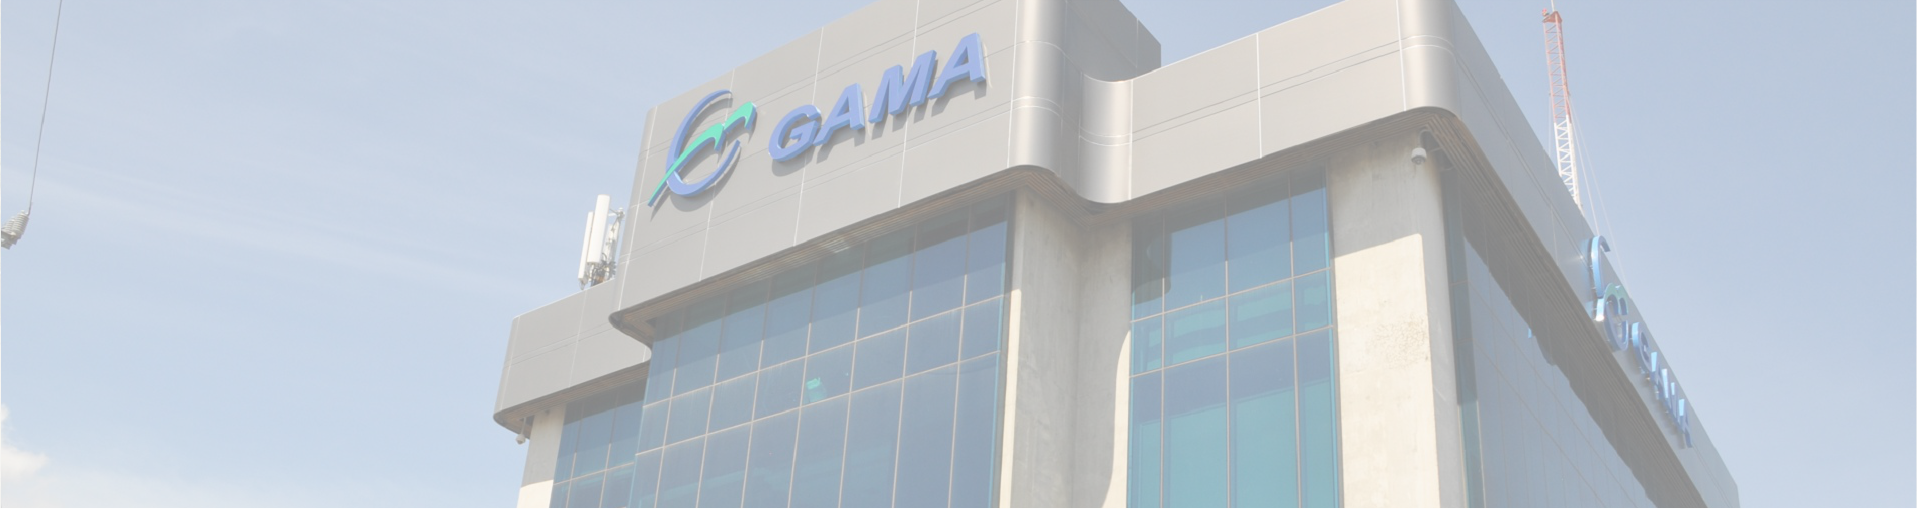 Slide-gama05